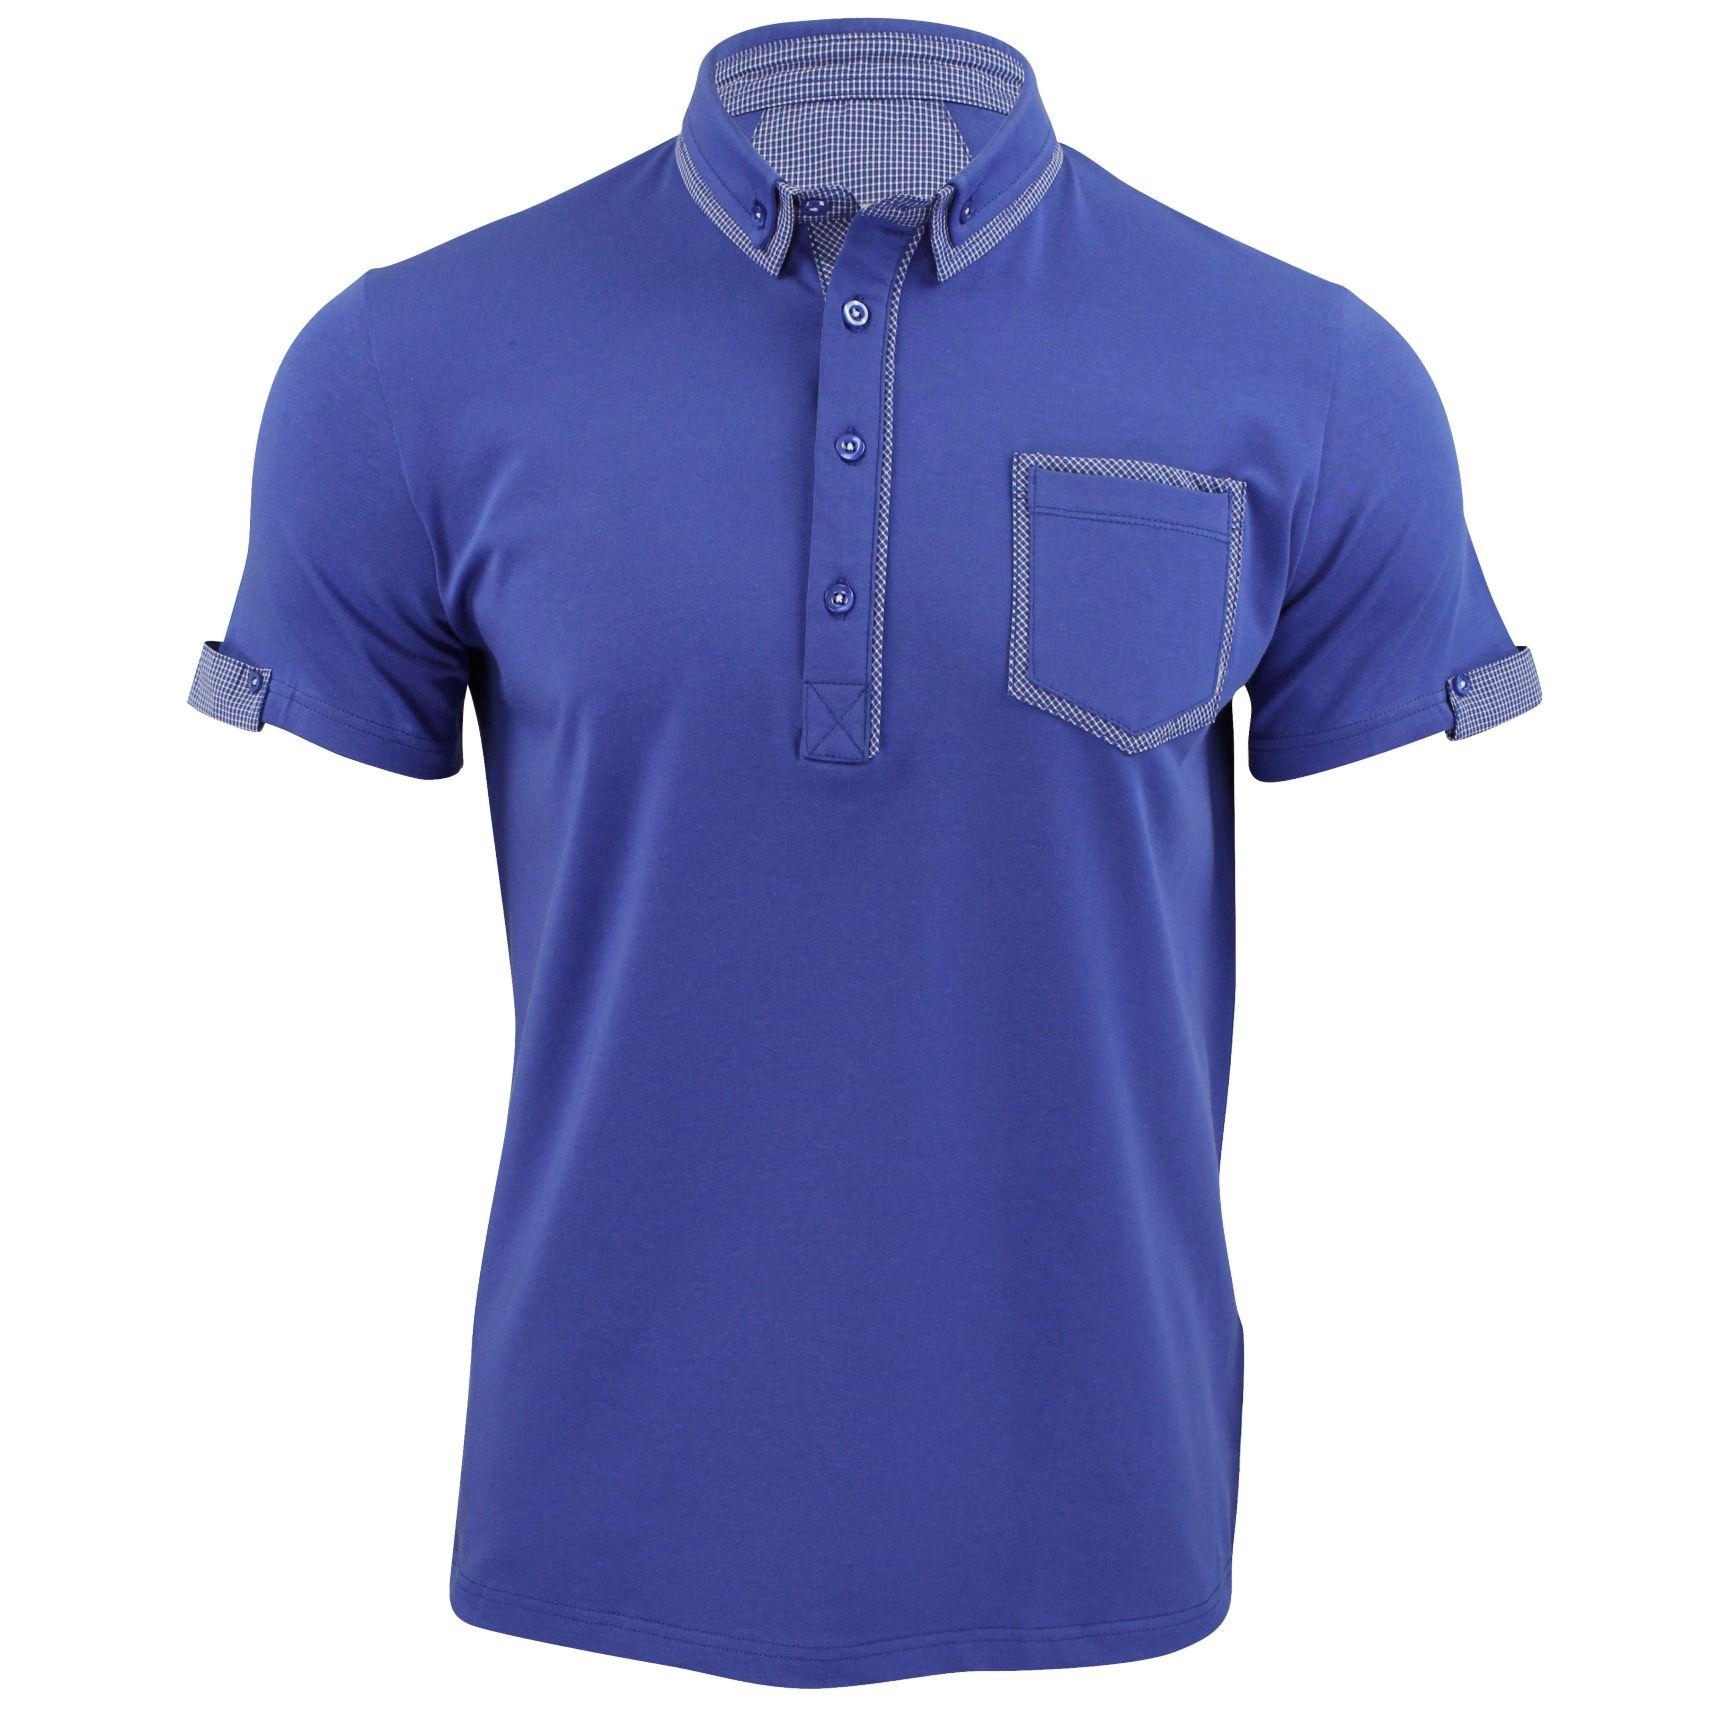 mens polo shirt xact clothing cotton rich gingham collar